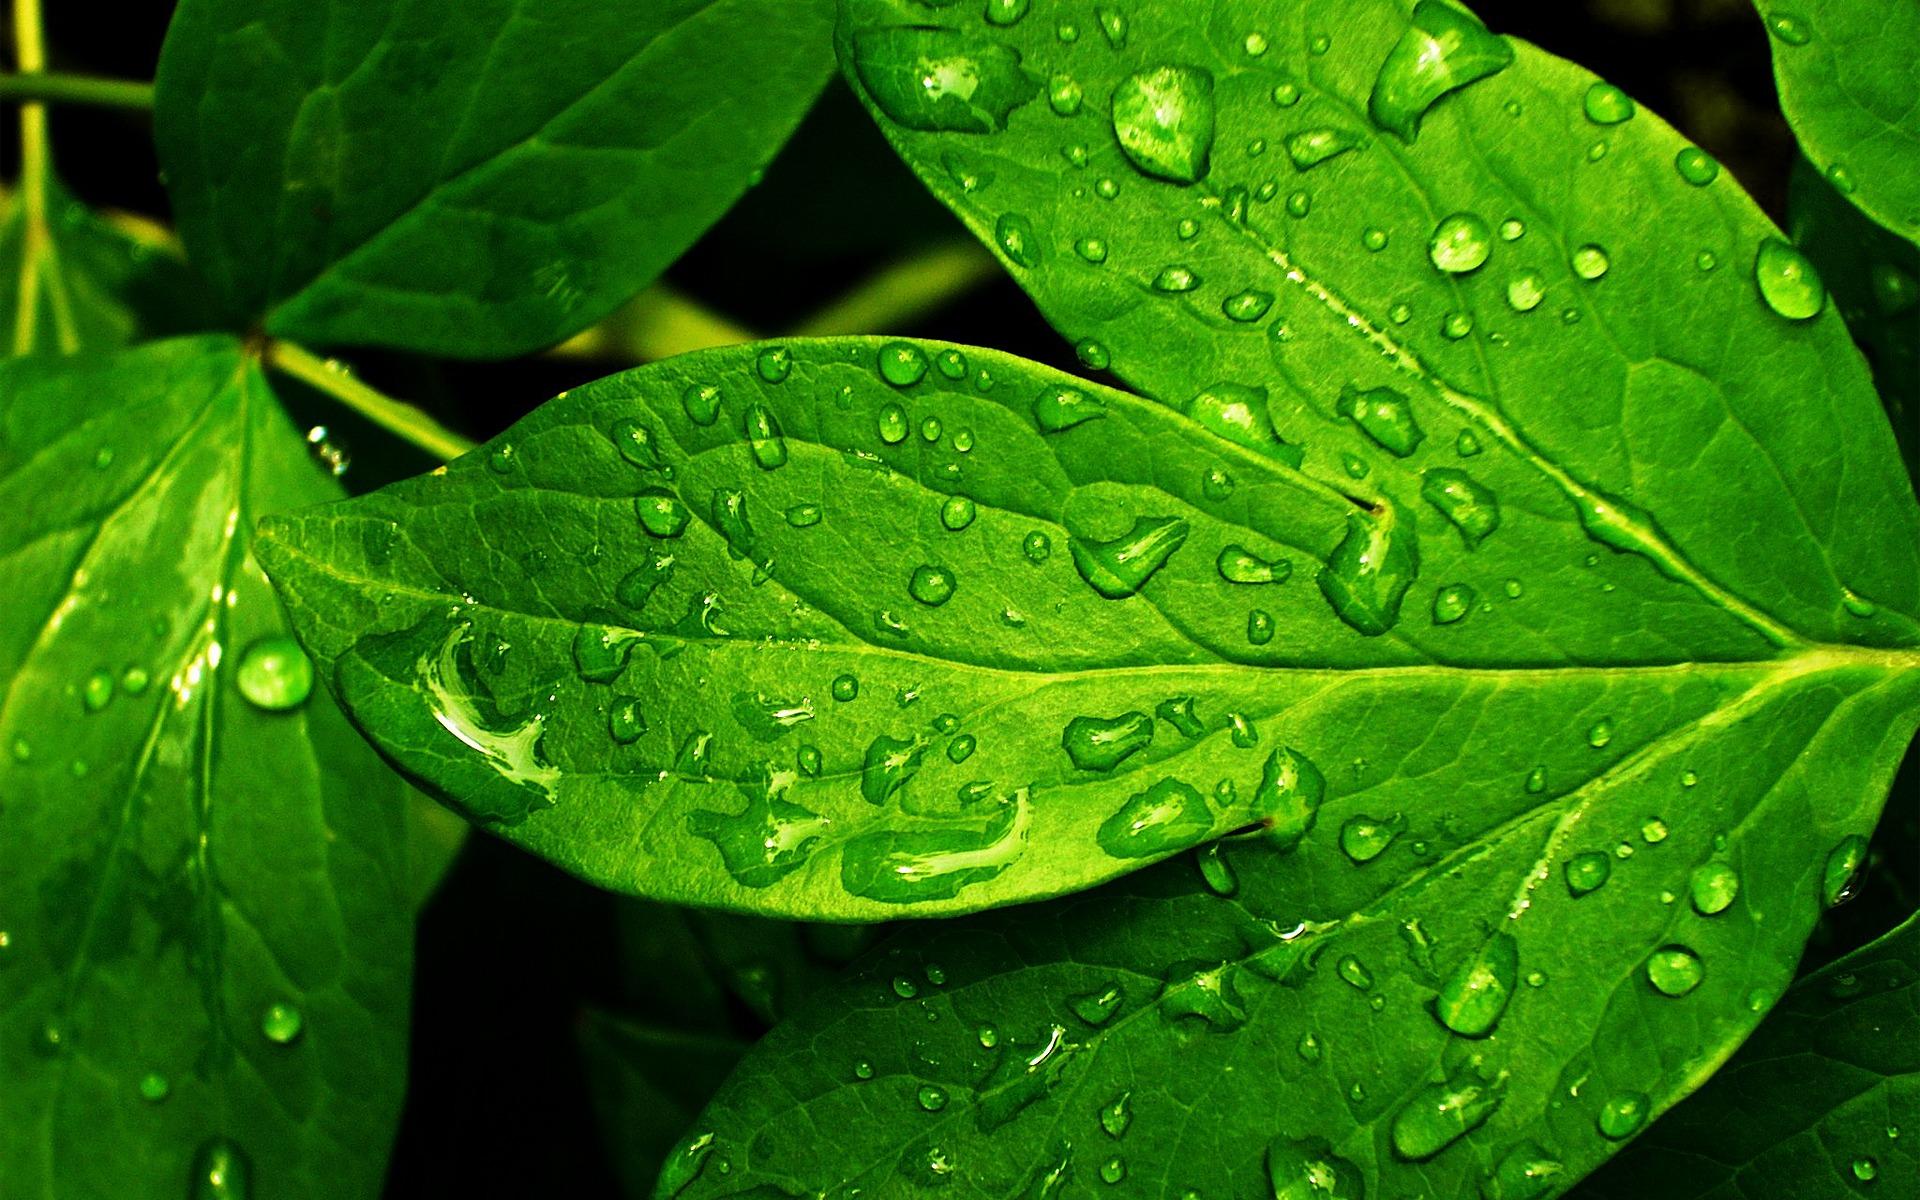 leaves fresh nature plants wallpapers desktop leaf water hd refreshing backgrounds cut